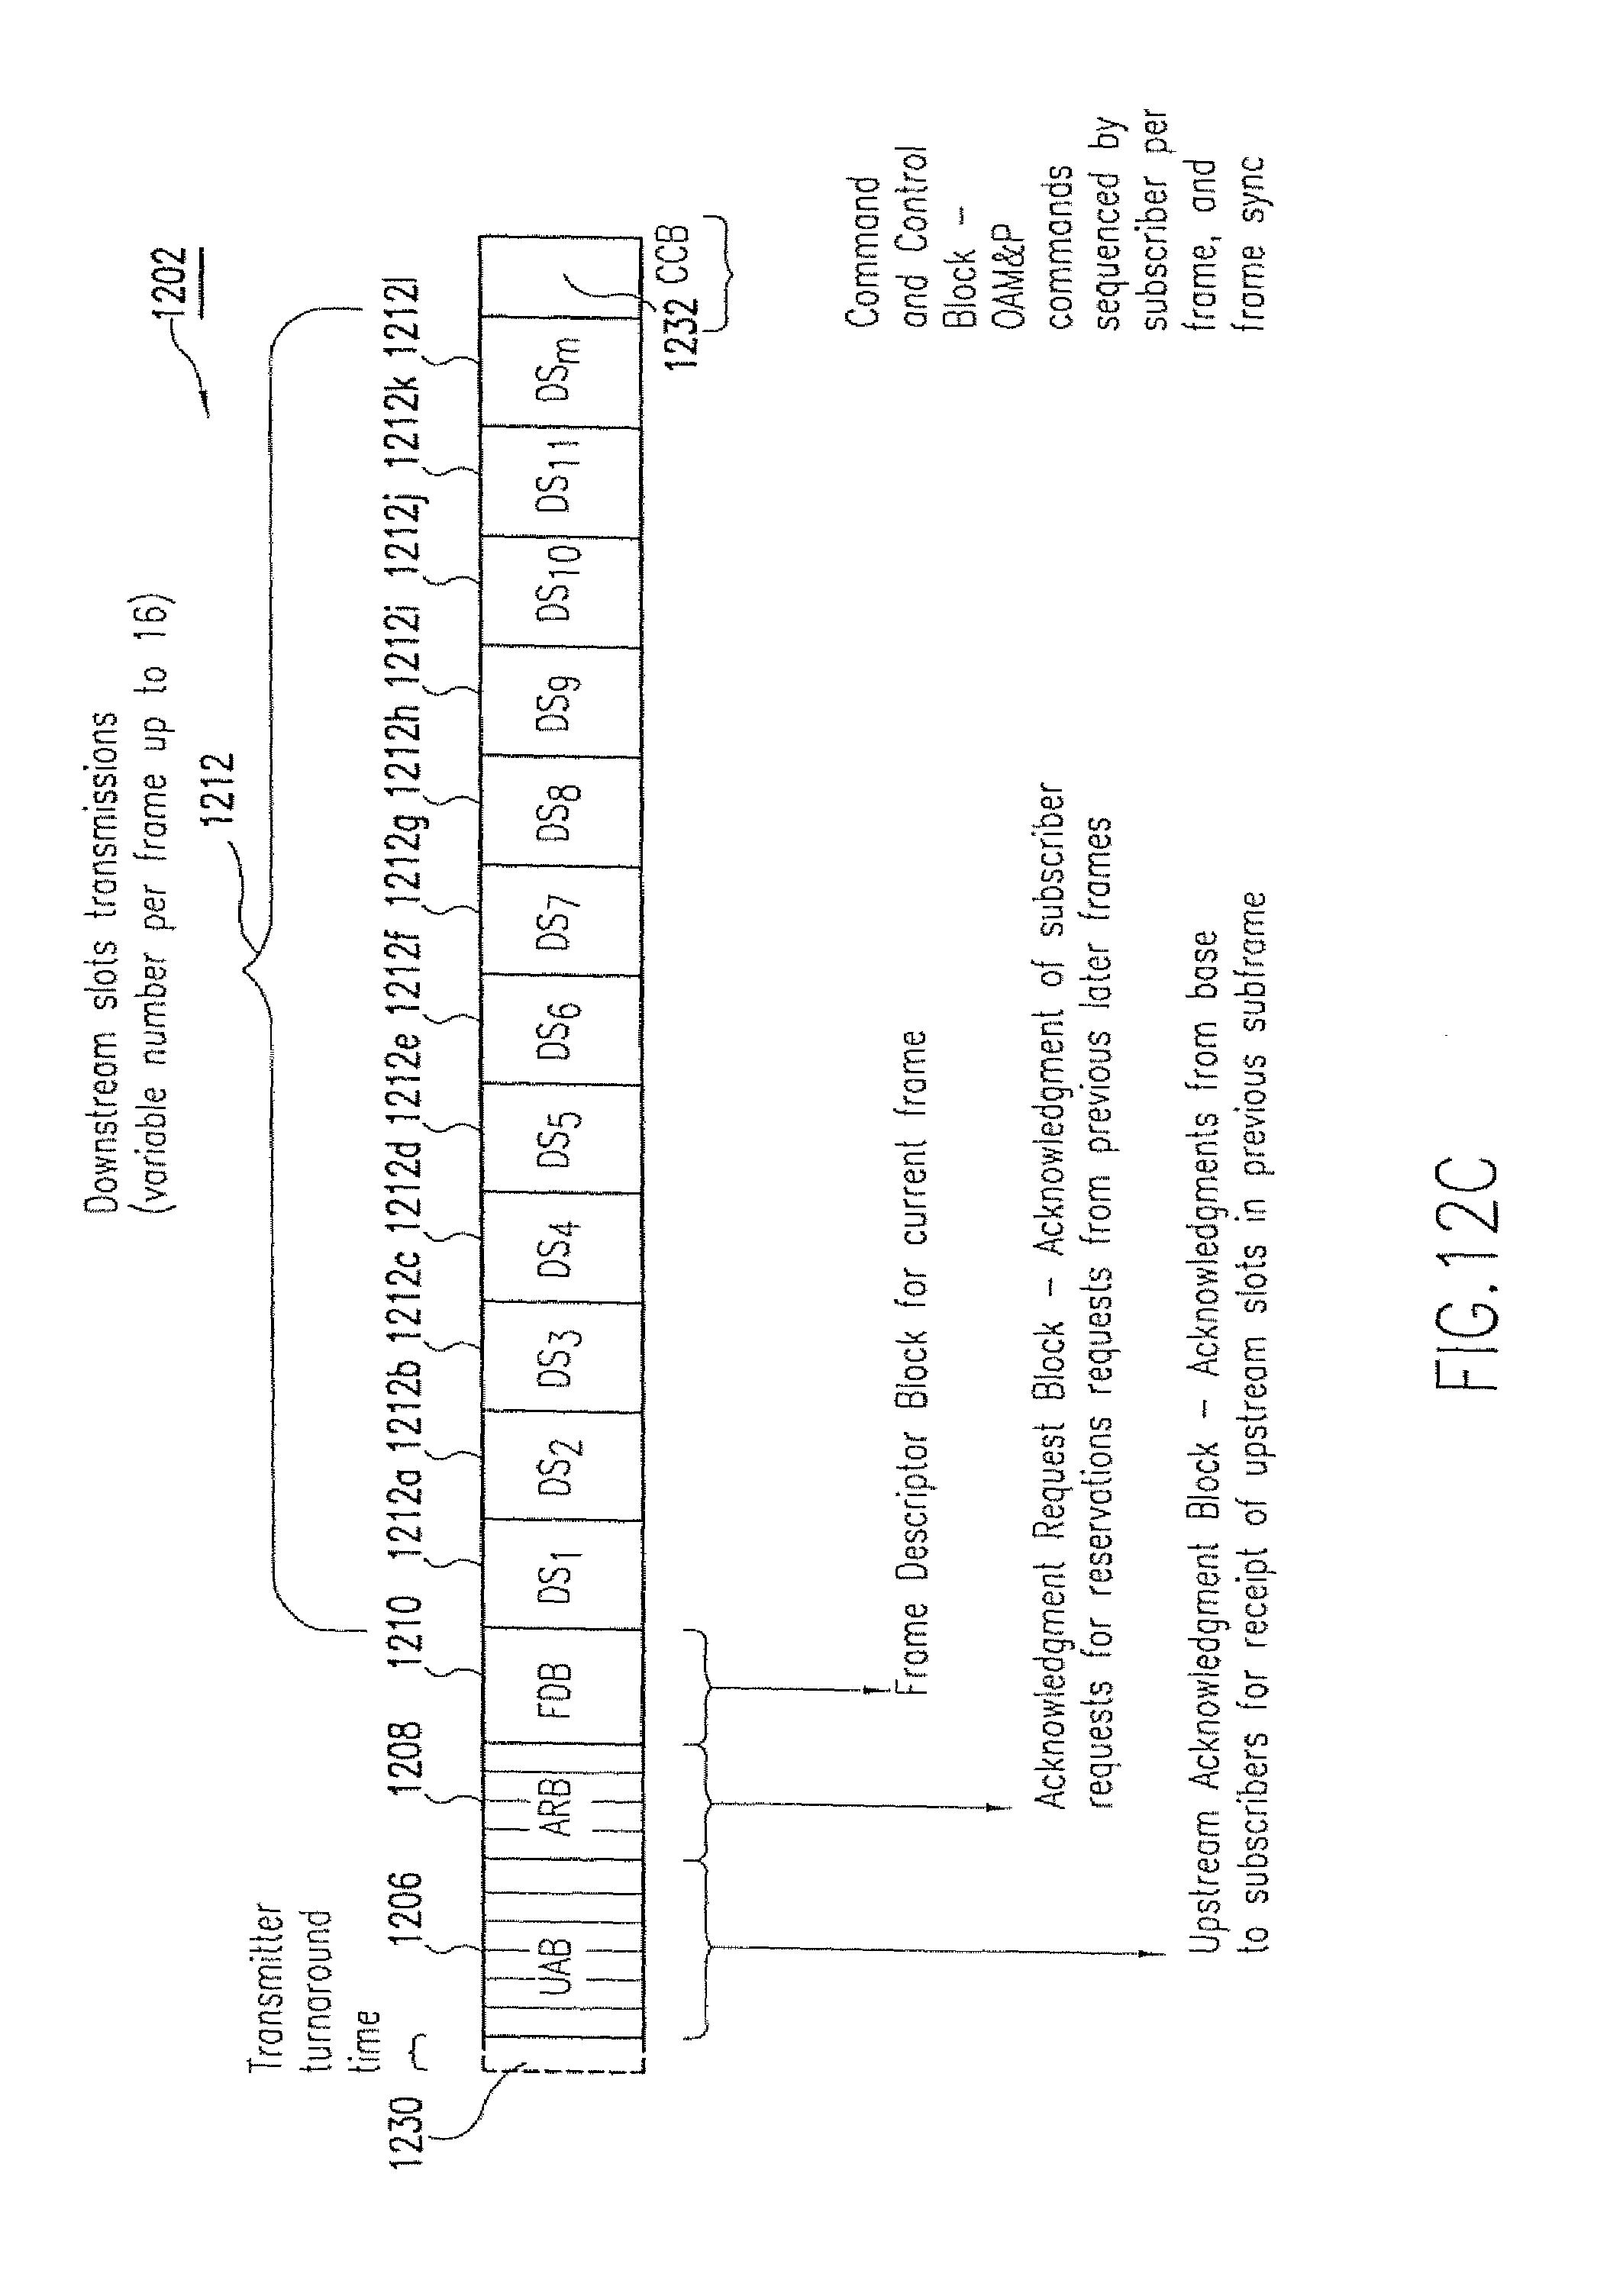 Patent US 7,251,218 B2